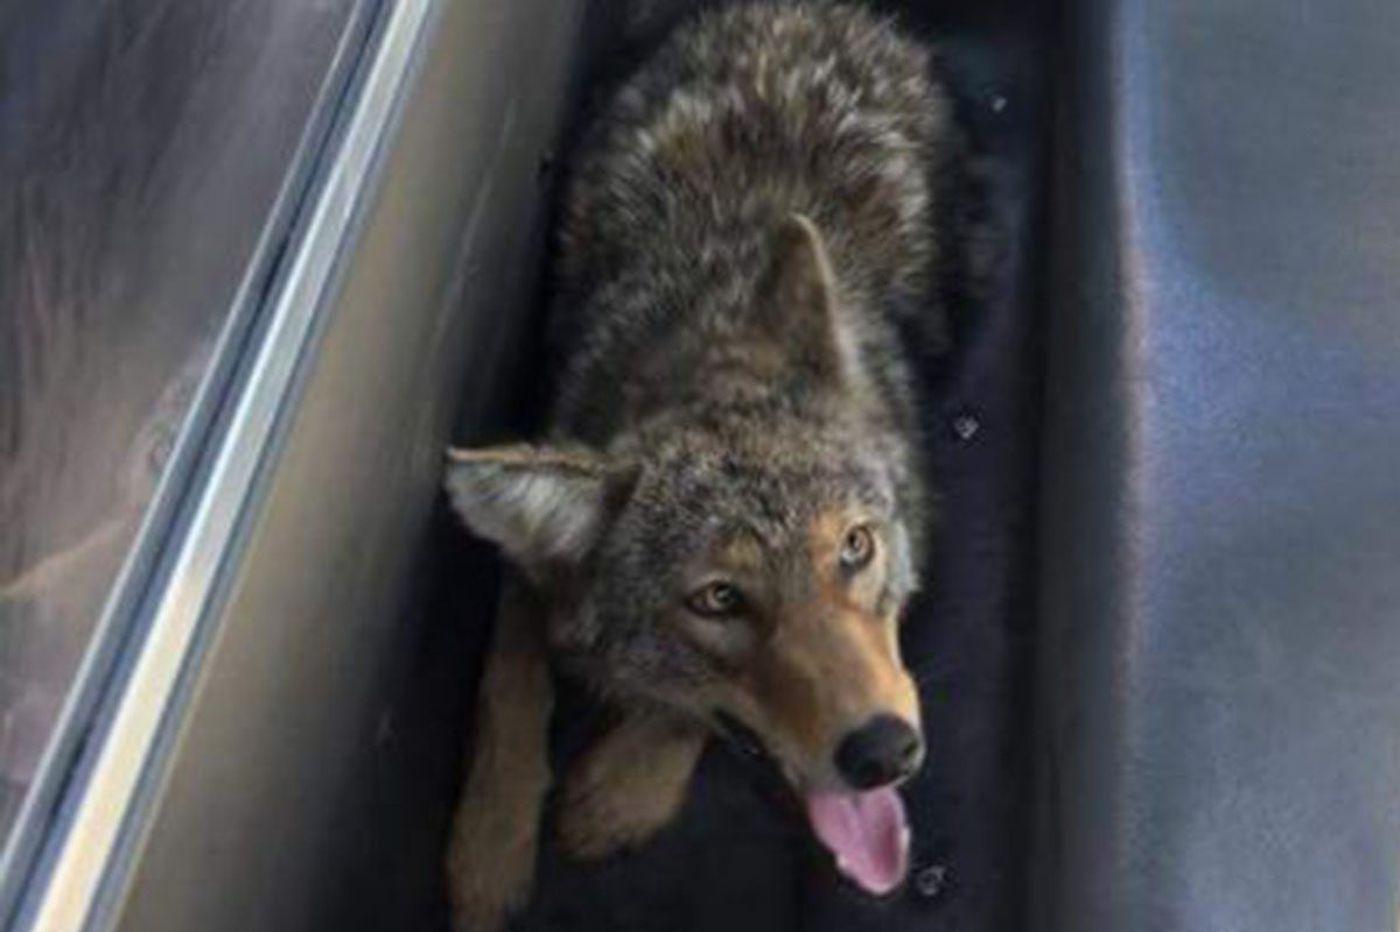 Police catch coyote in Philadelphia's Mayfair neighborhood